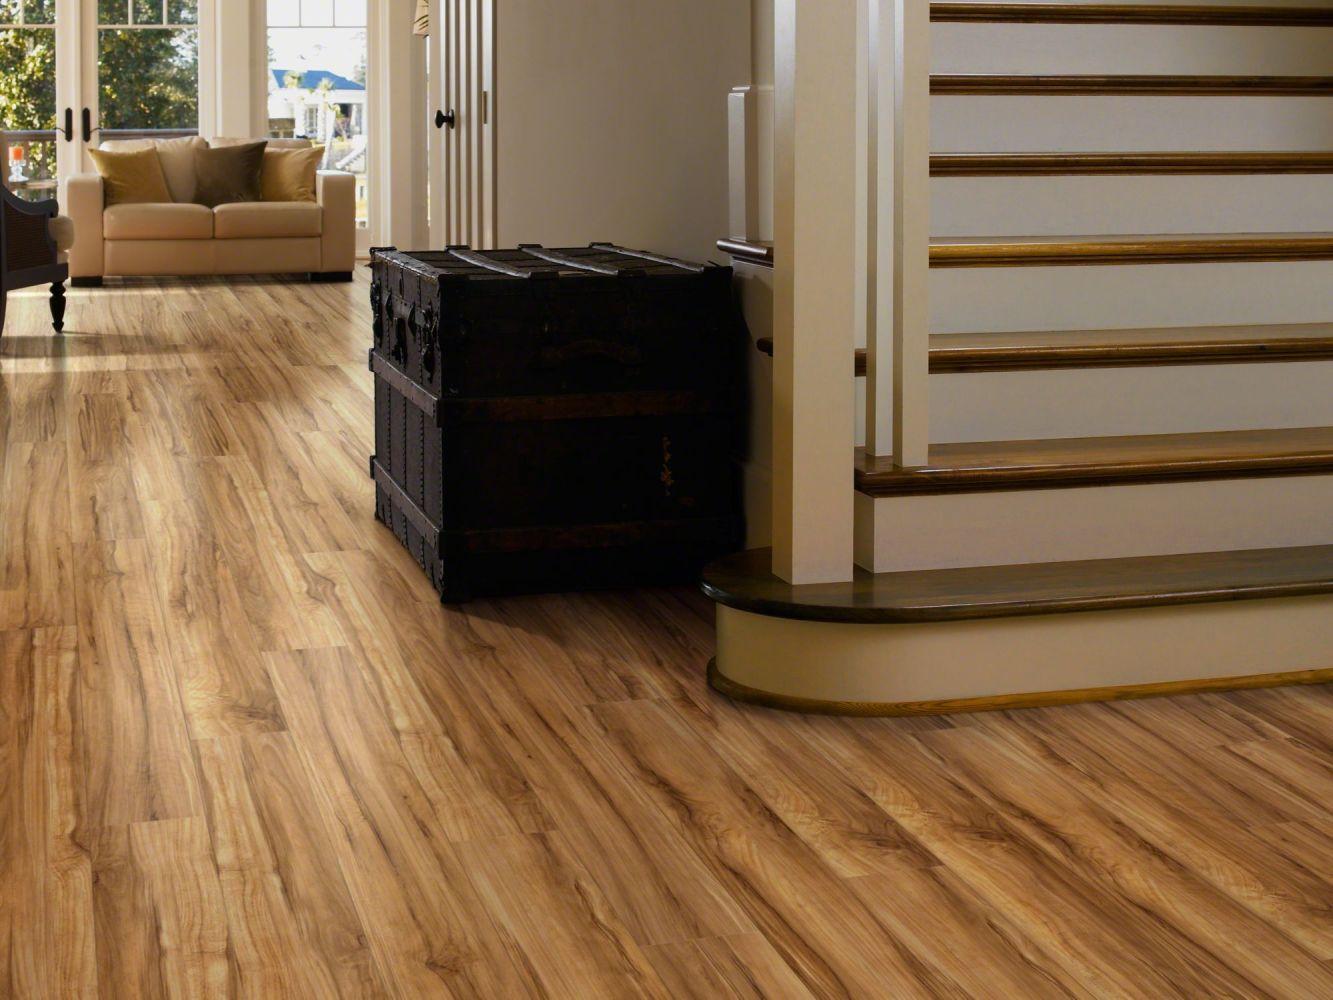 Shaw Floors Vinyl Residential Classico Plus Plank Frutta 00609_2426V